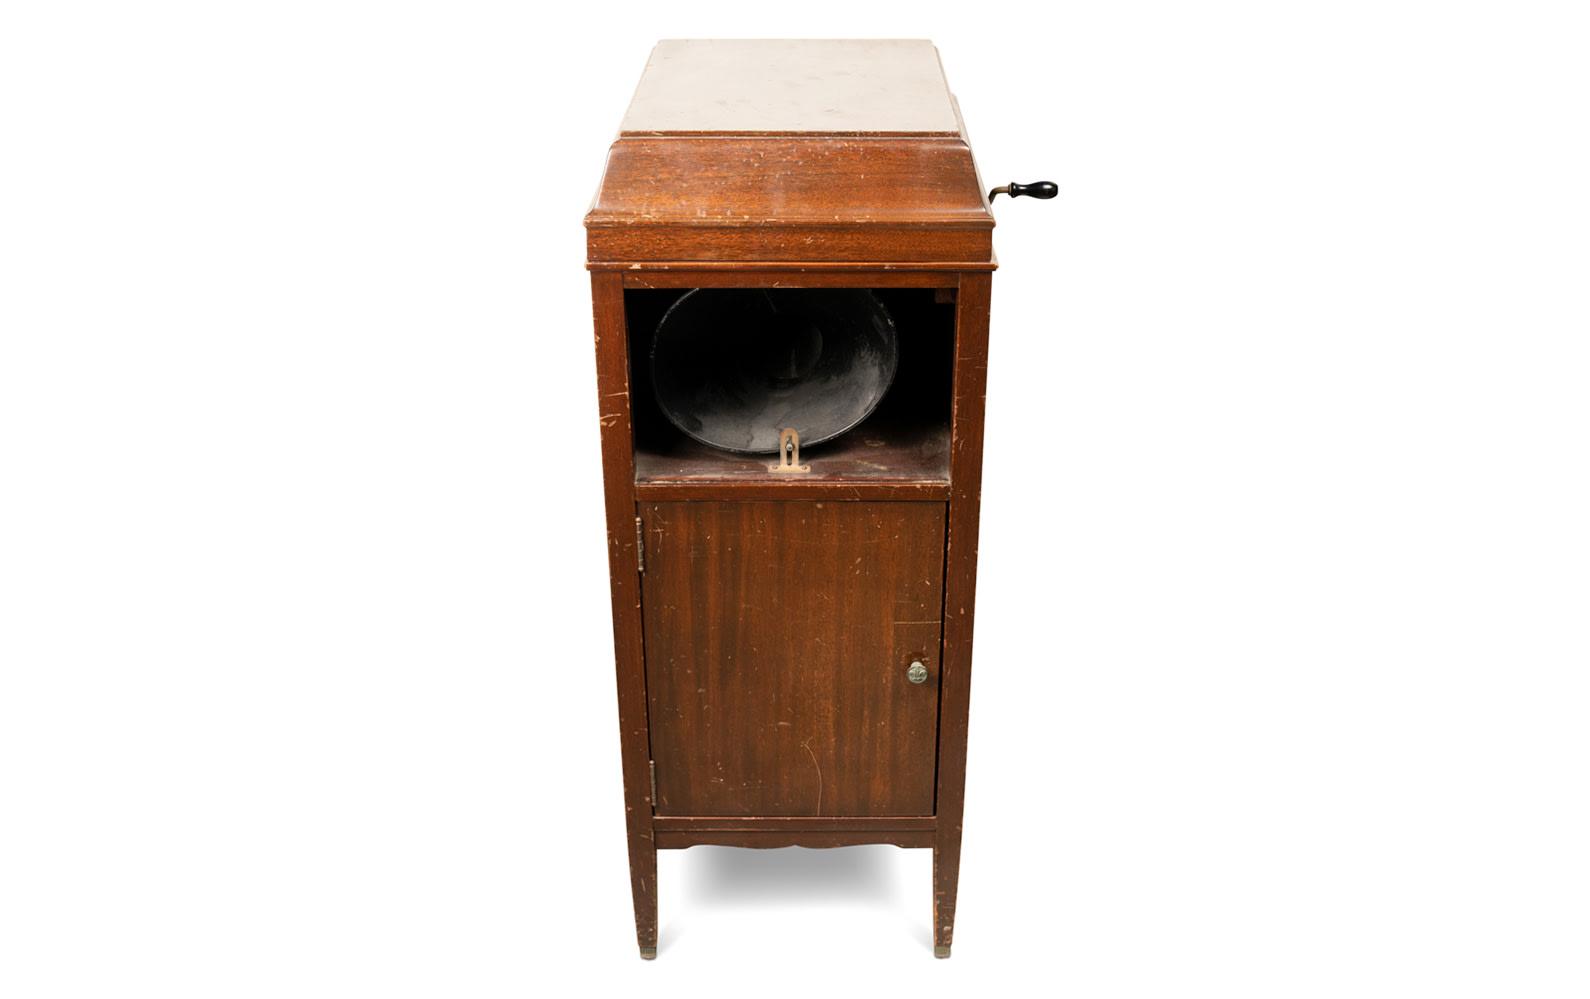 Prod/O21E - Phil Hill C 2021/C0168_Edison Amberola Phonograph/C0168_Edison_Amberola_Phonograph_1_jov71p